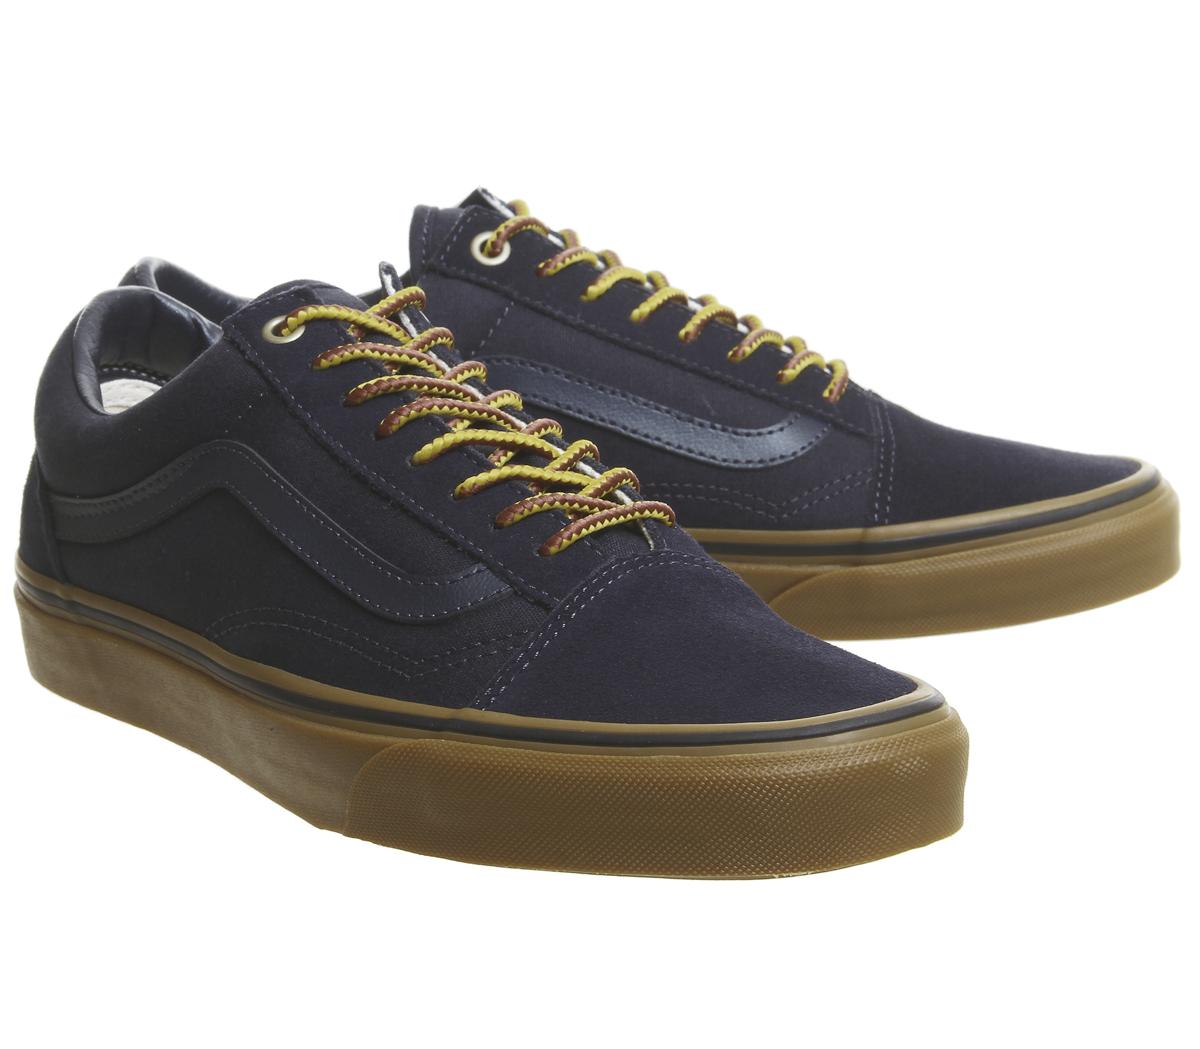 deporte Vans Boot Lace Skool de Zapatillas Shoes Sky Old Captain xRgqZRwa